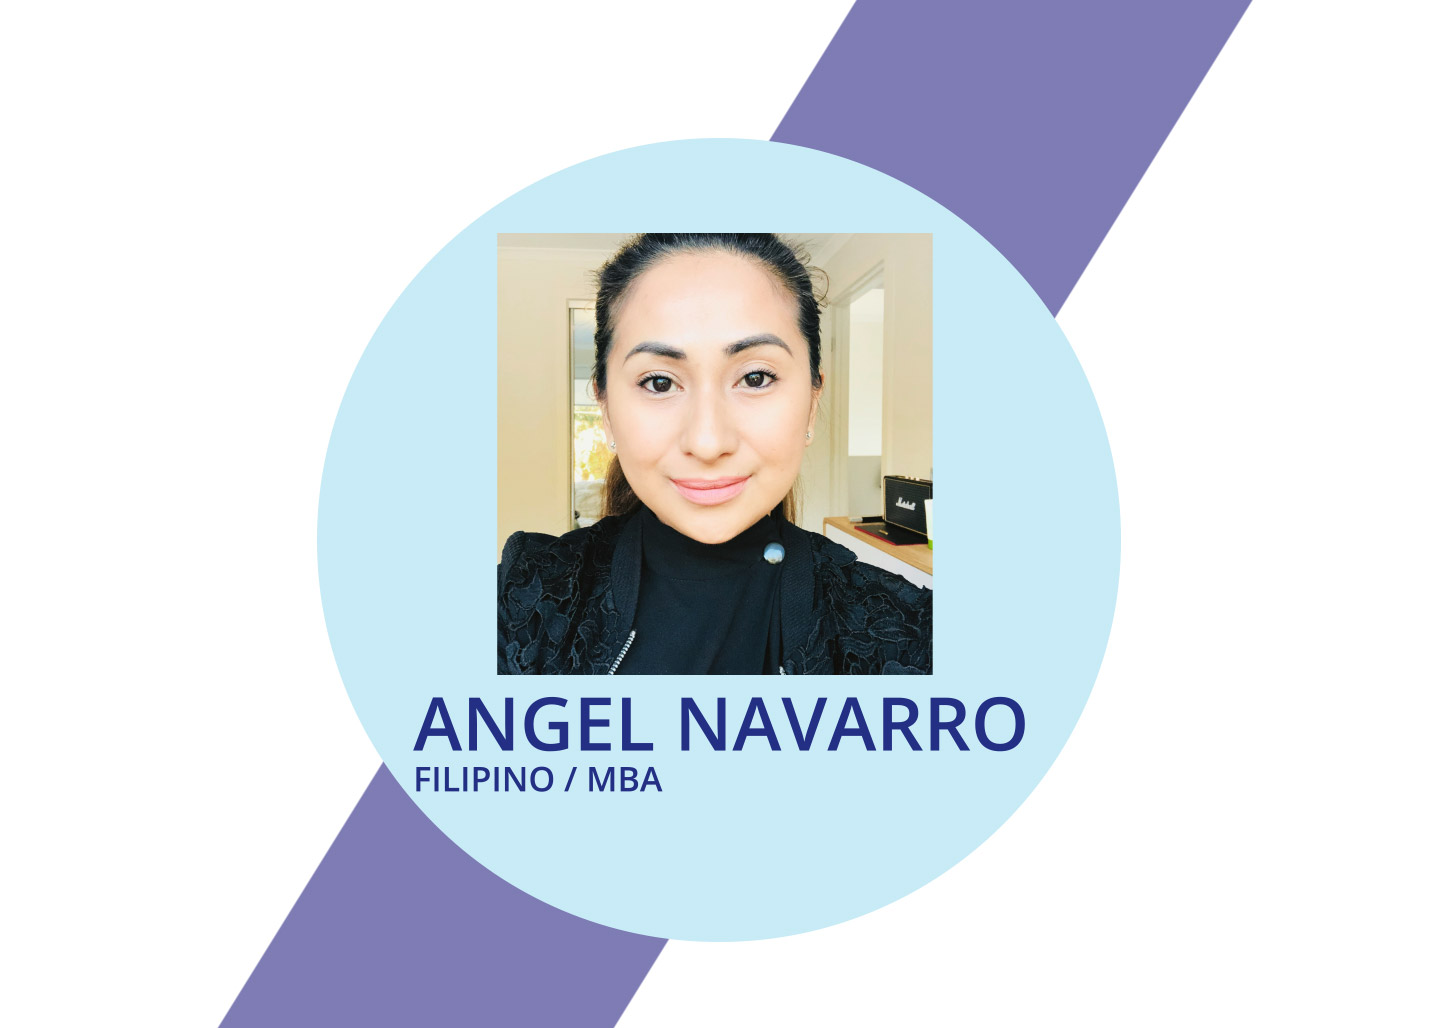 Angel Navarro Testimonial Video Thumbnail